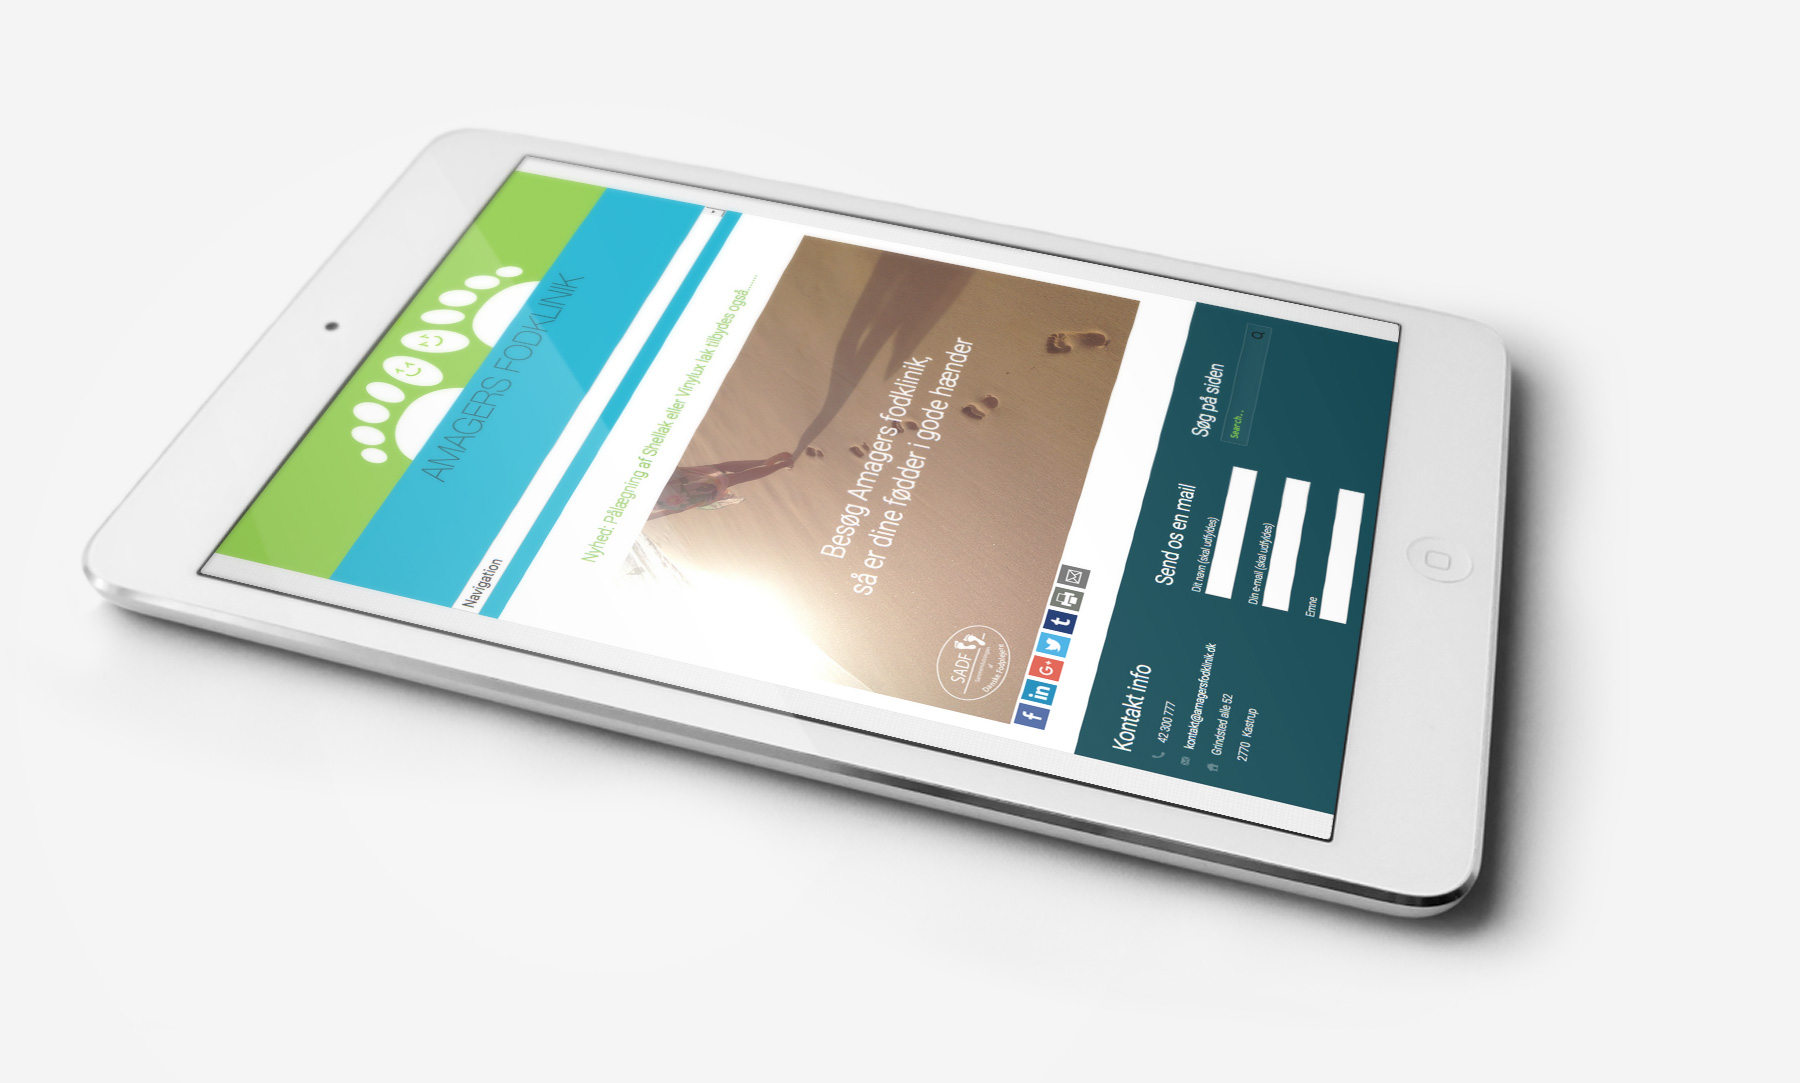 Amagers Fodklinik: Tablet